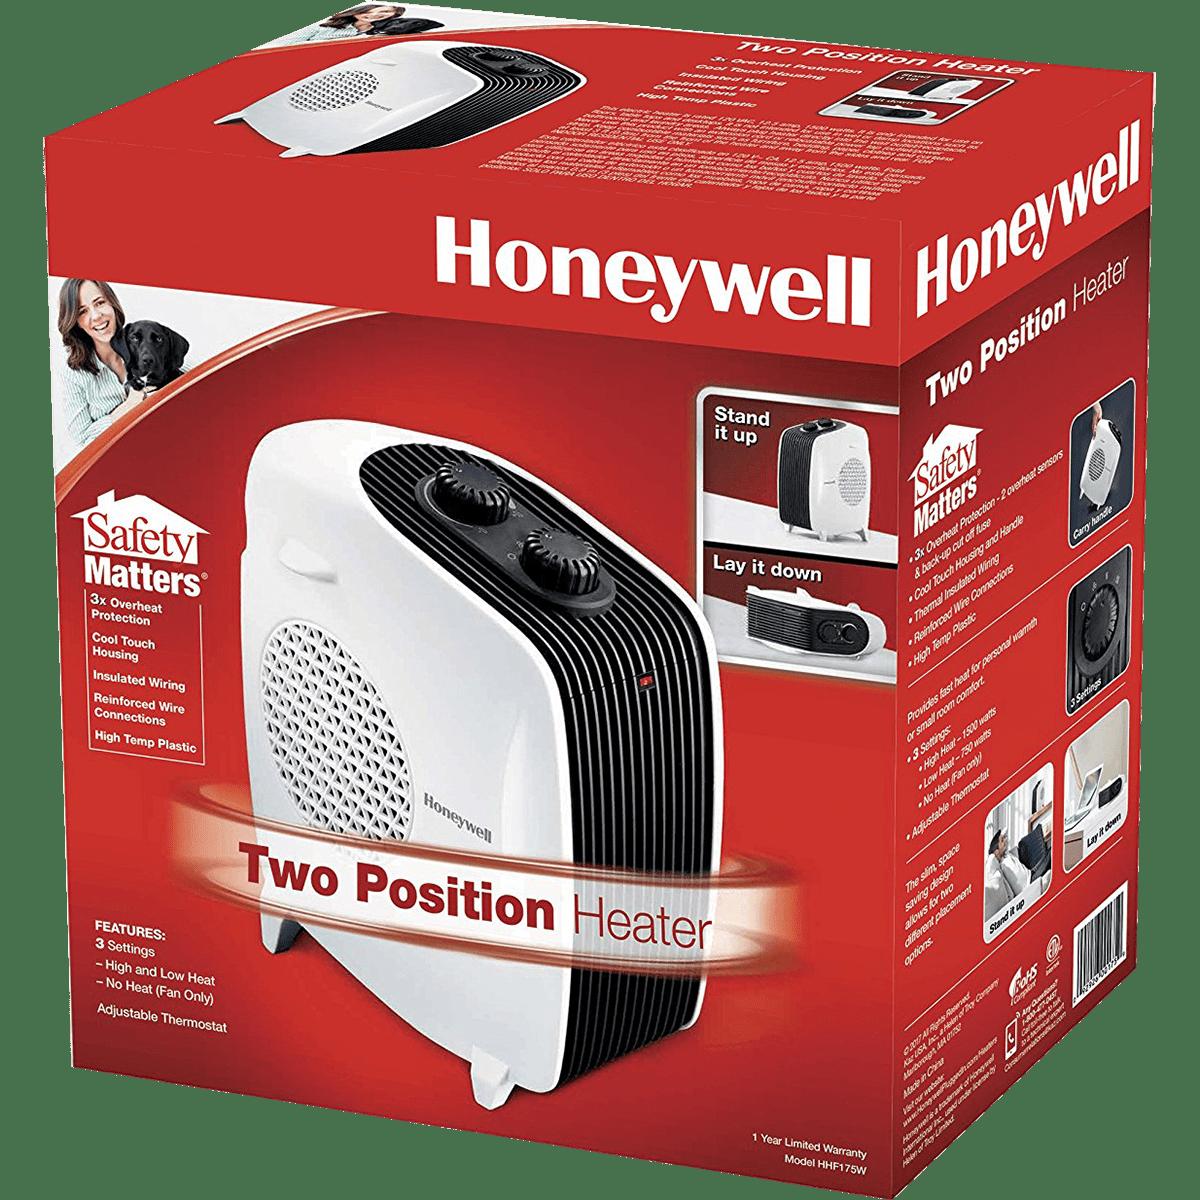 Honeywell Dual Position Heater Fan Hhf175w Sylvane Lasko Box Fuse